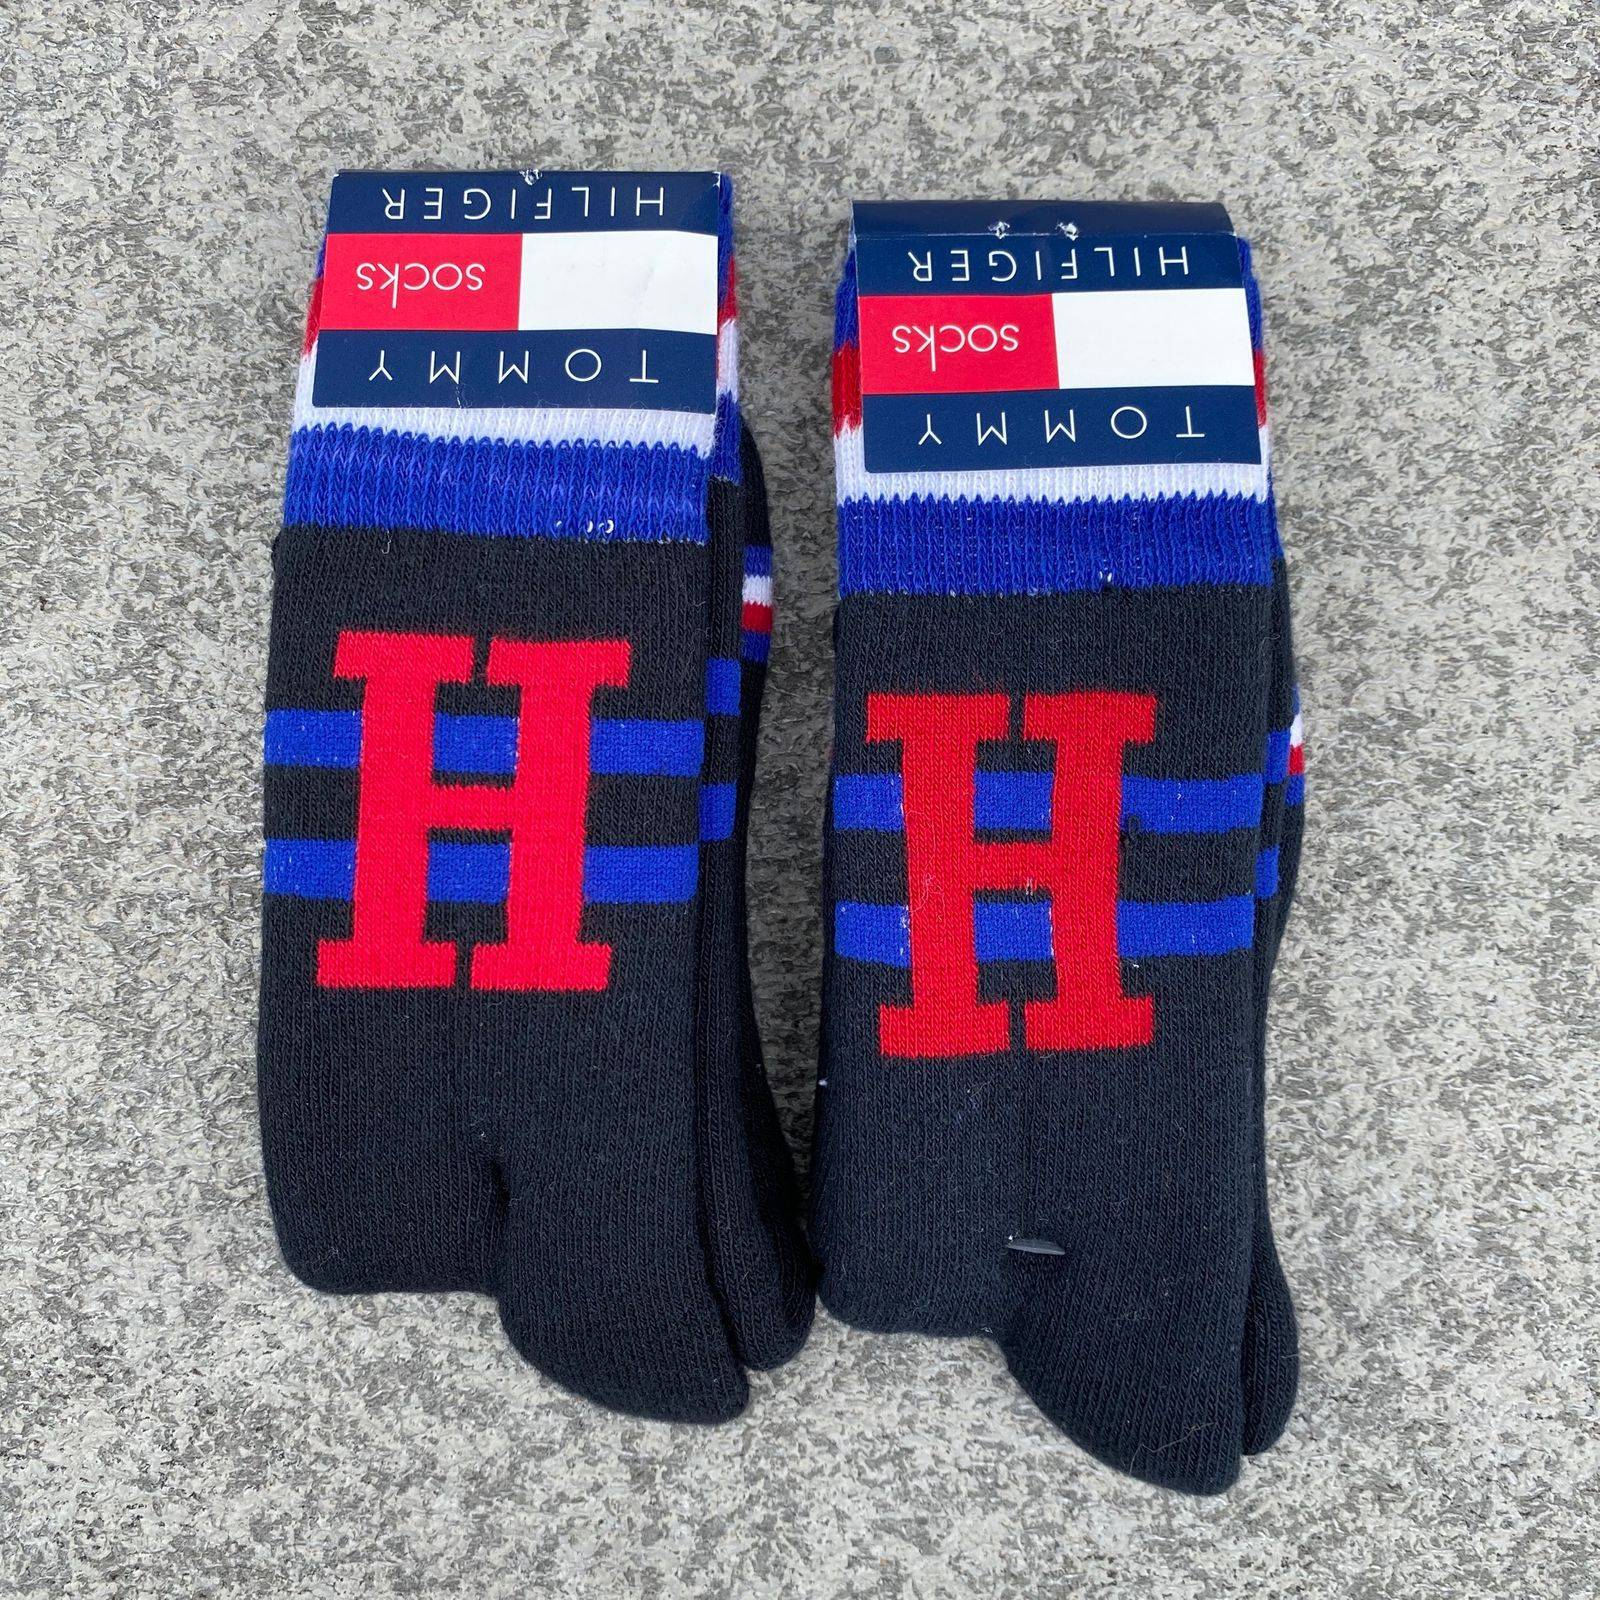 Tommy Hilfiger 1990s Logo Socks (2 Pair)